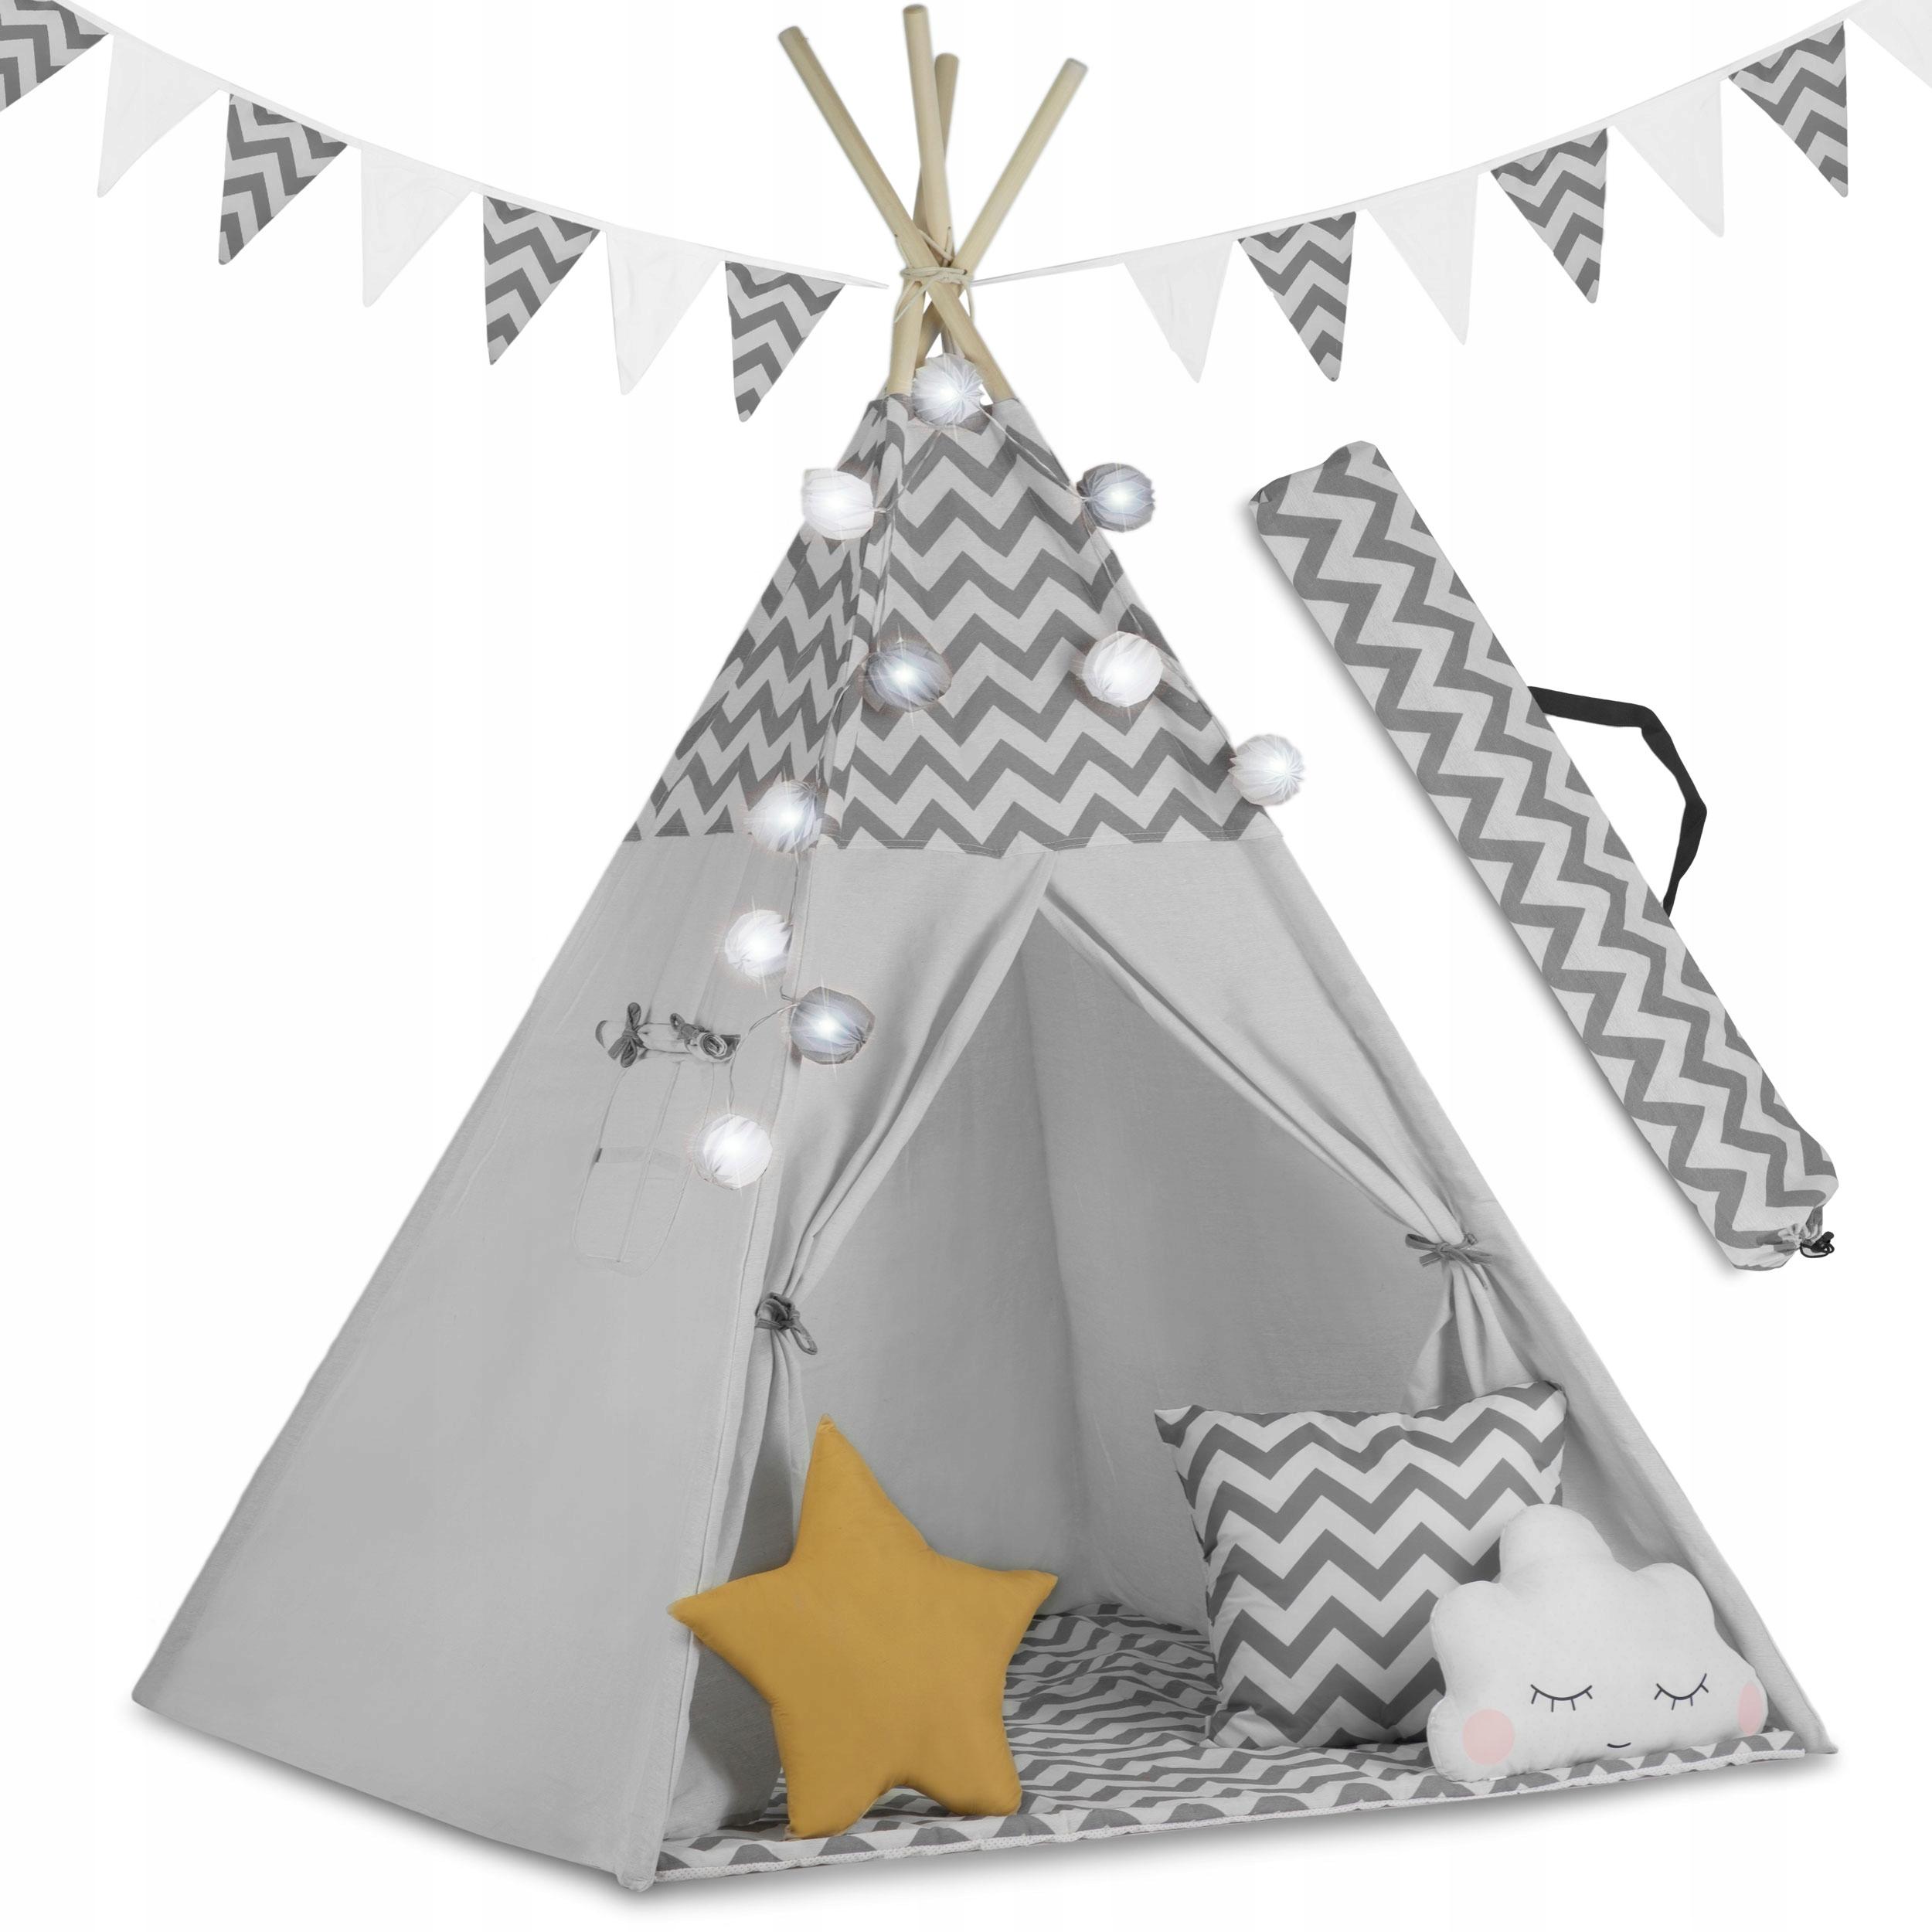 Детская палатка TIPI TEEPEE Garland Pillows